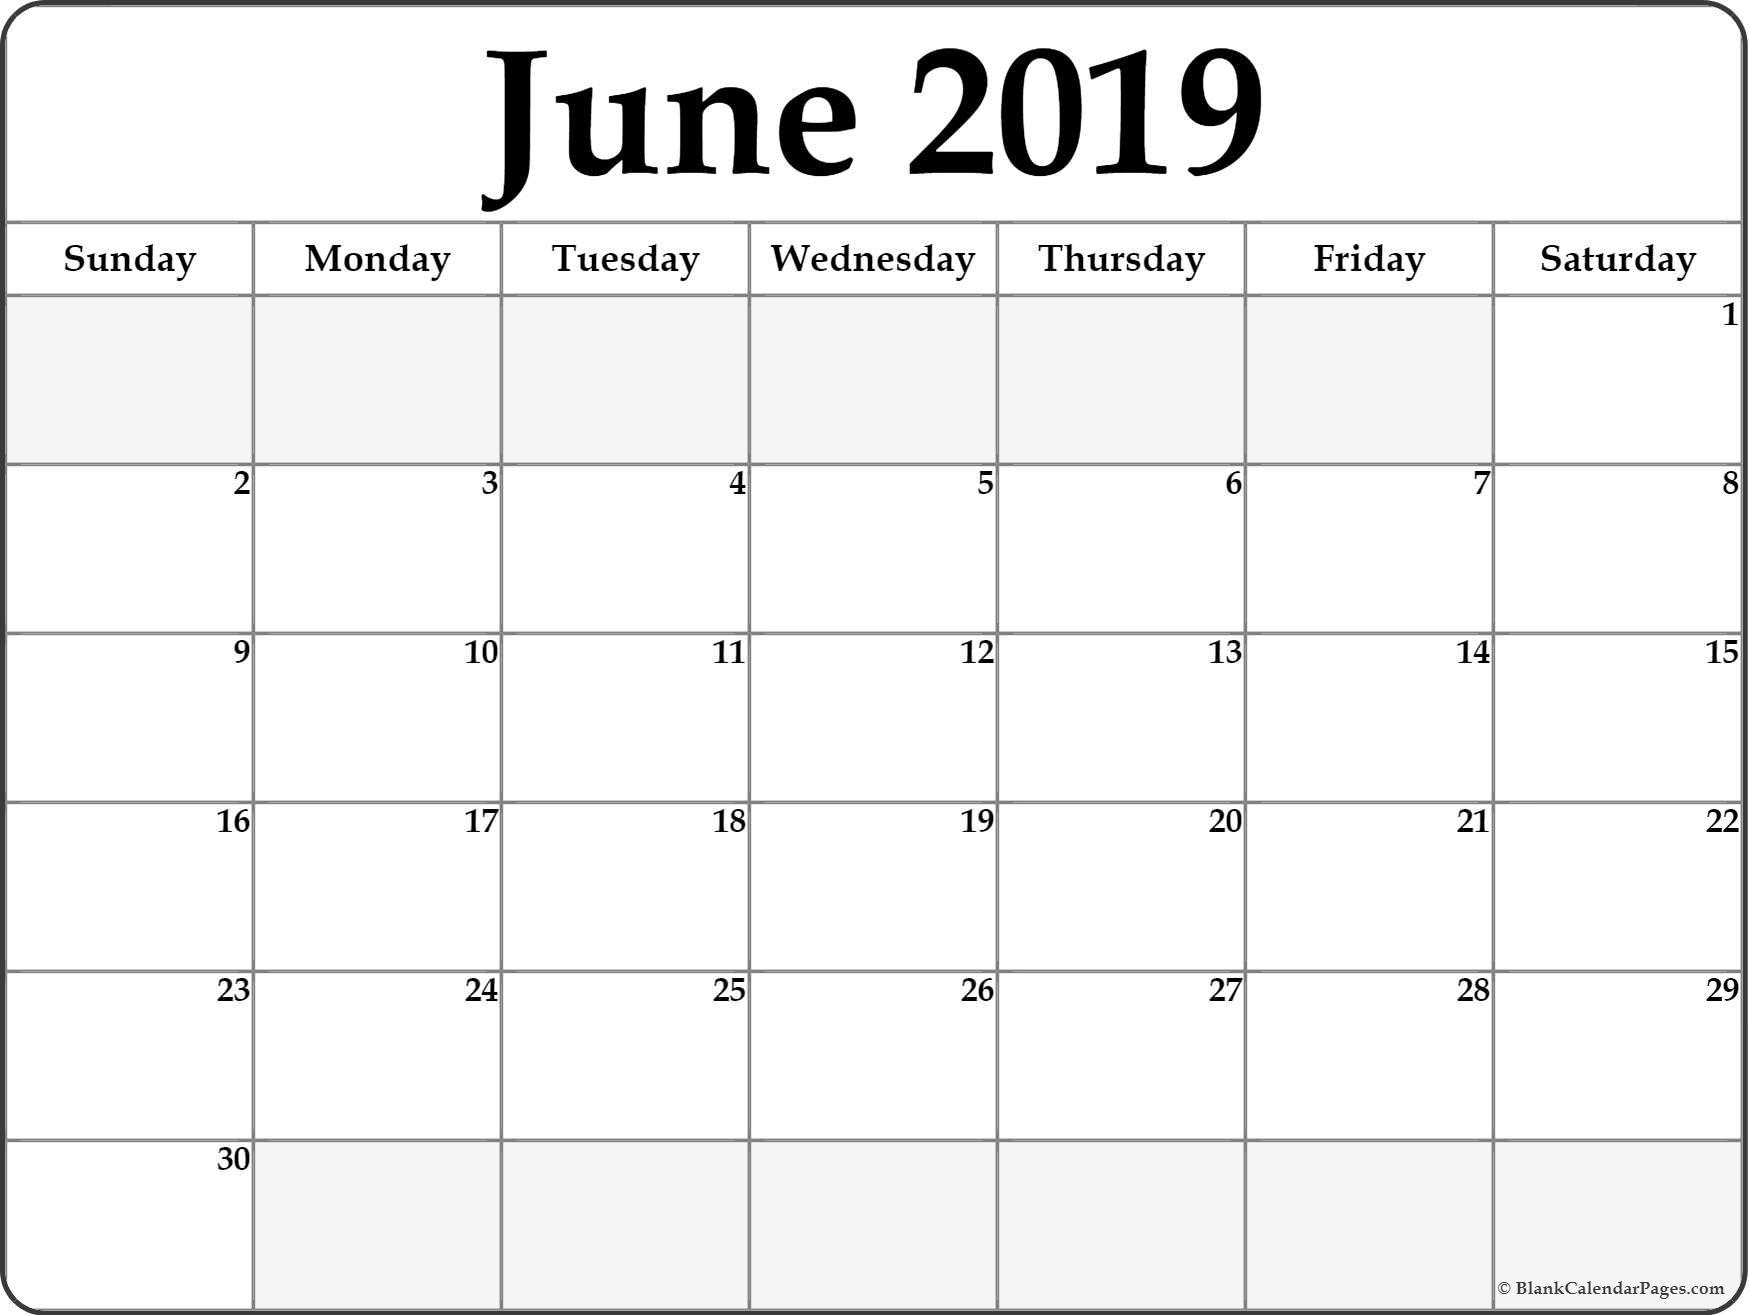 June 2019 Calendar | Free Printable Monthly Calendars throughout Blank Calendar June July